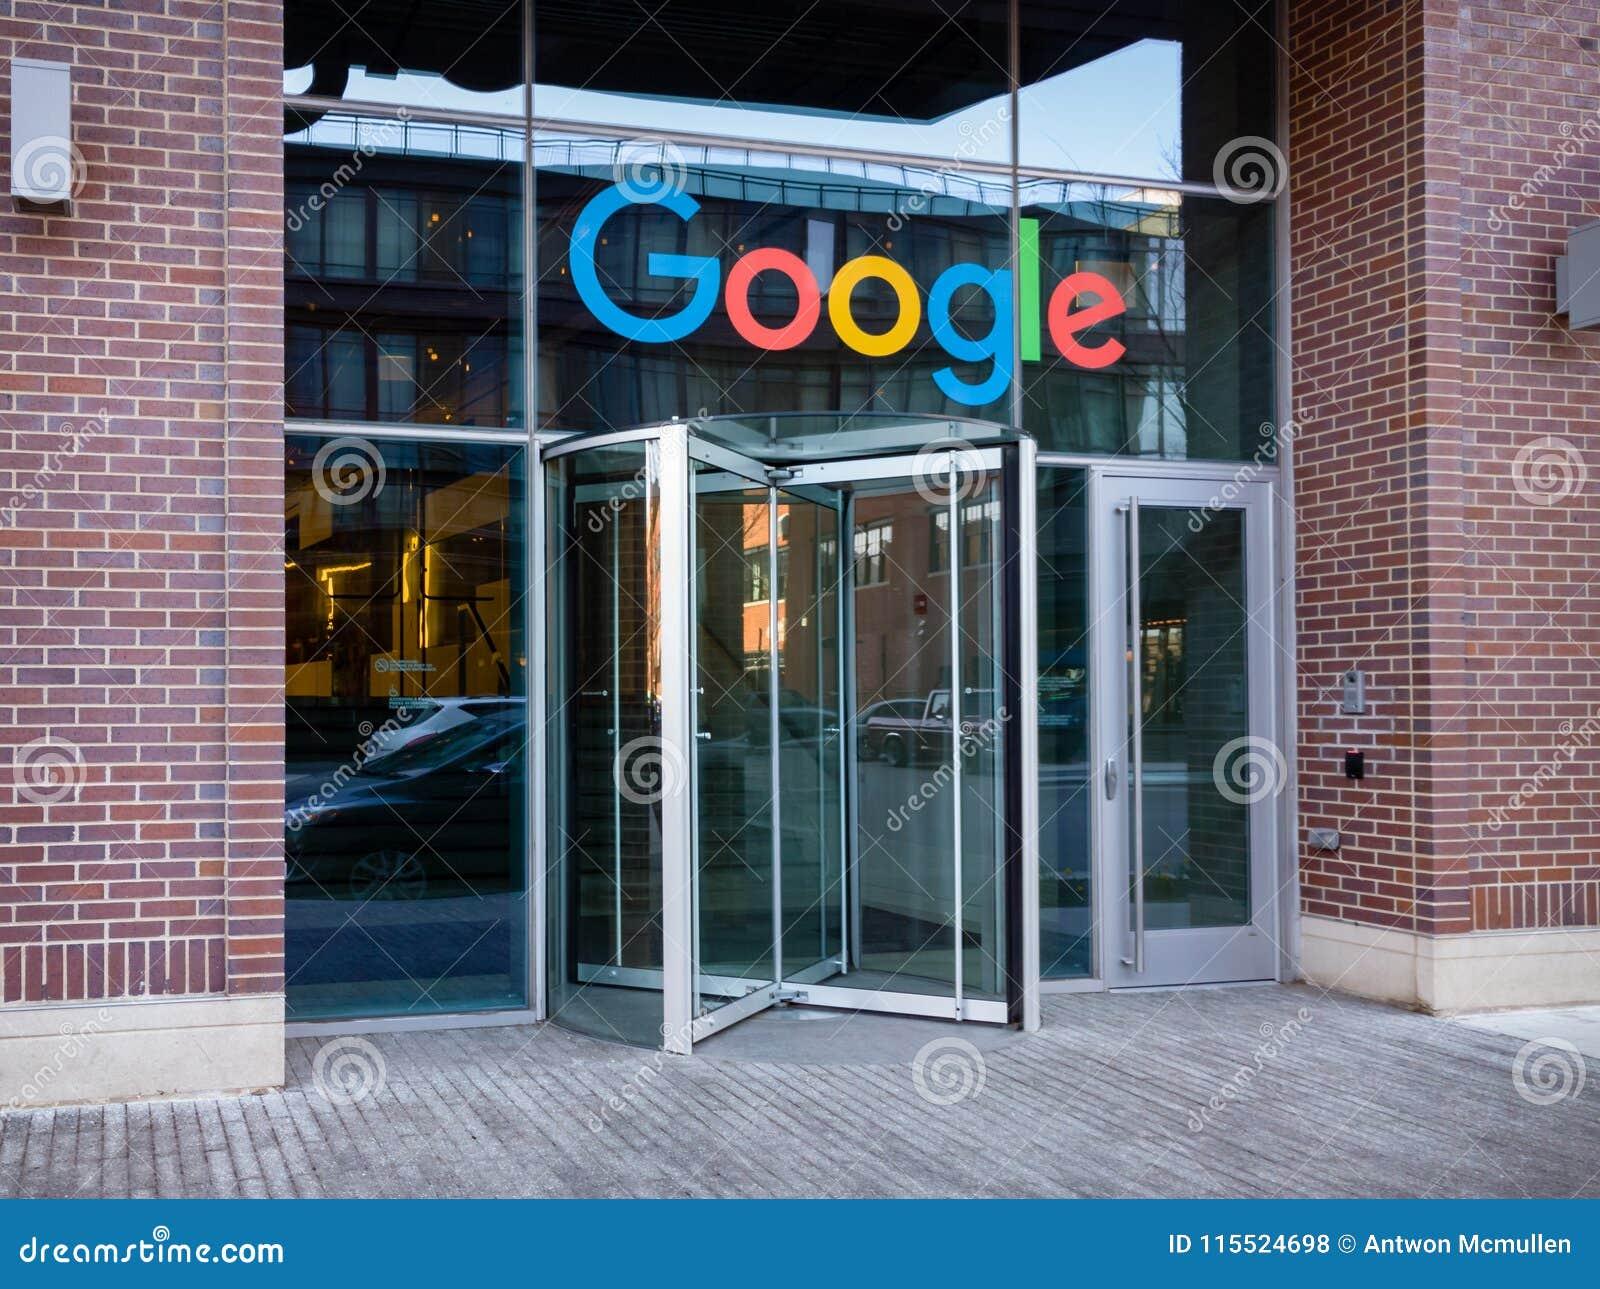 Revolving Door Entrance To Google Corporate Campus In Chicago.